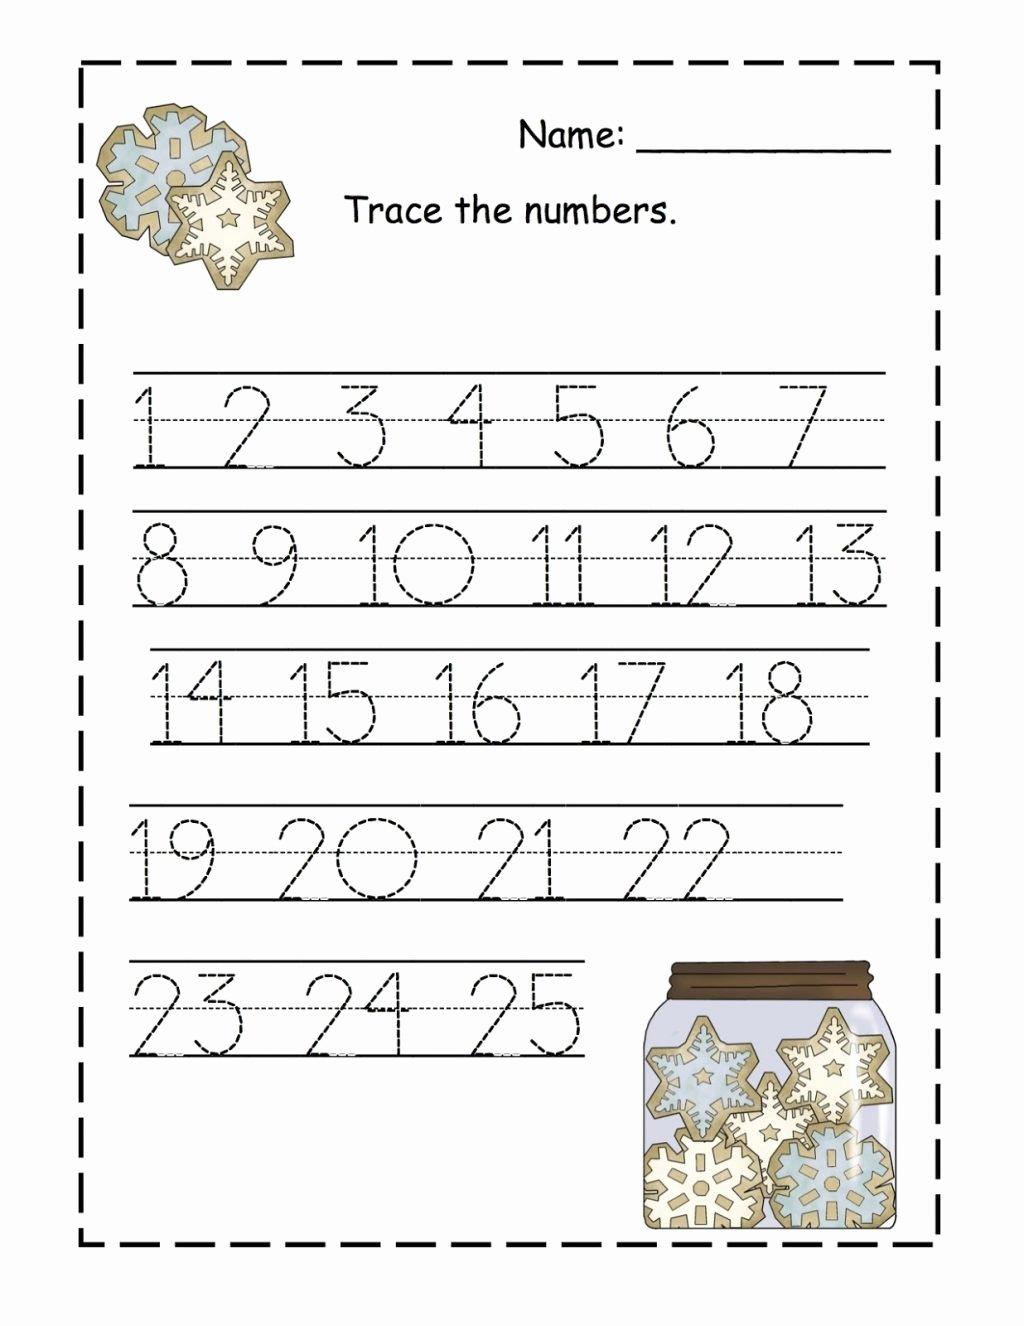 Printable Tracing Worksheets for Preschoolers Fresh Worksheet Worksheet Free Tracing Worksheets astonishing